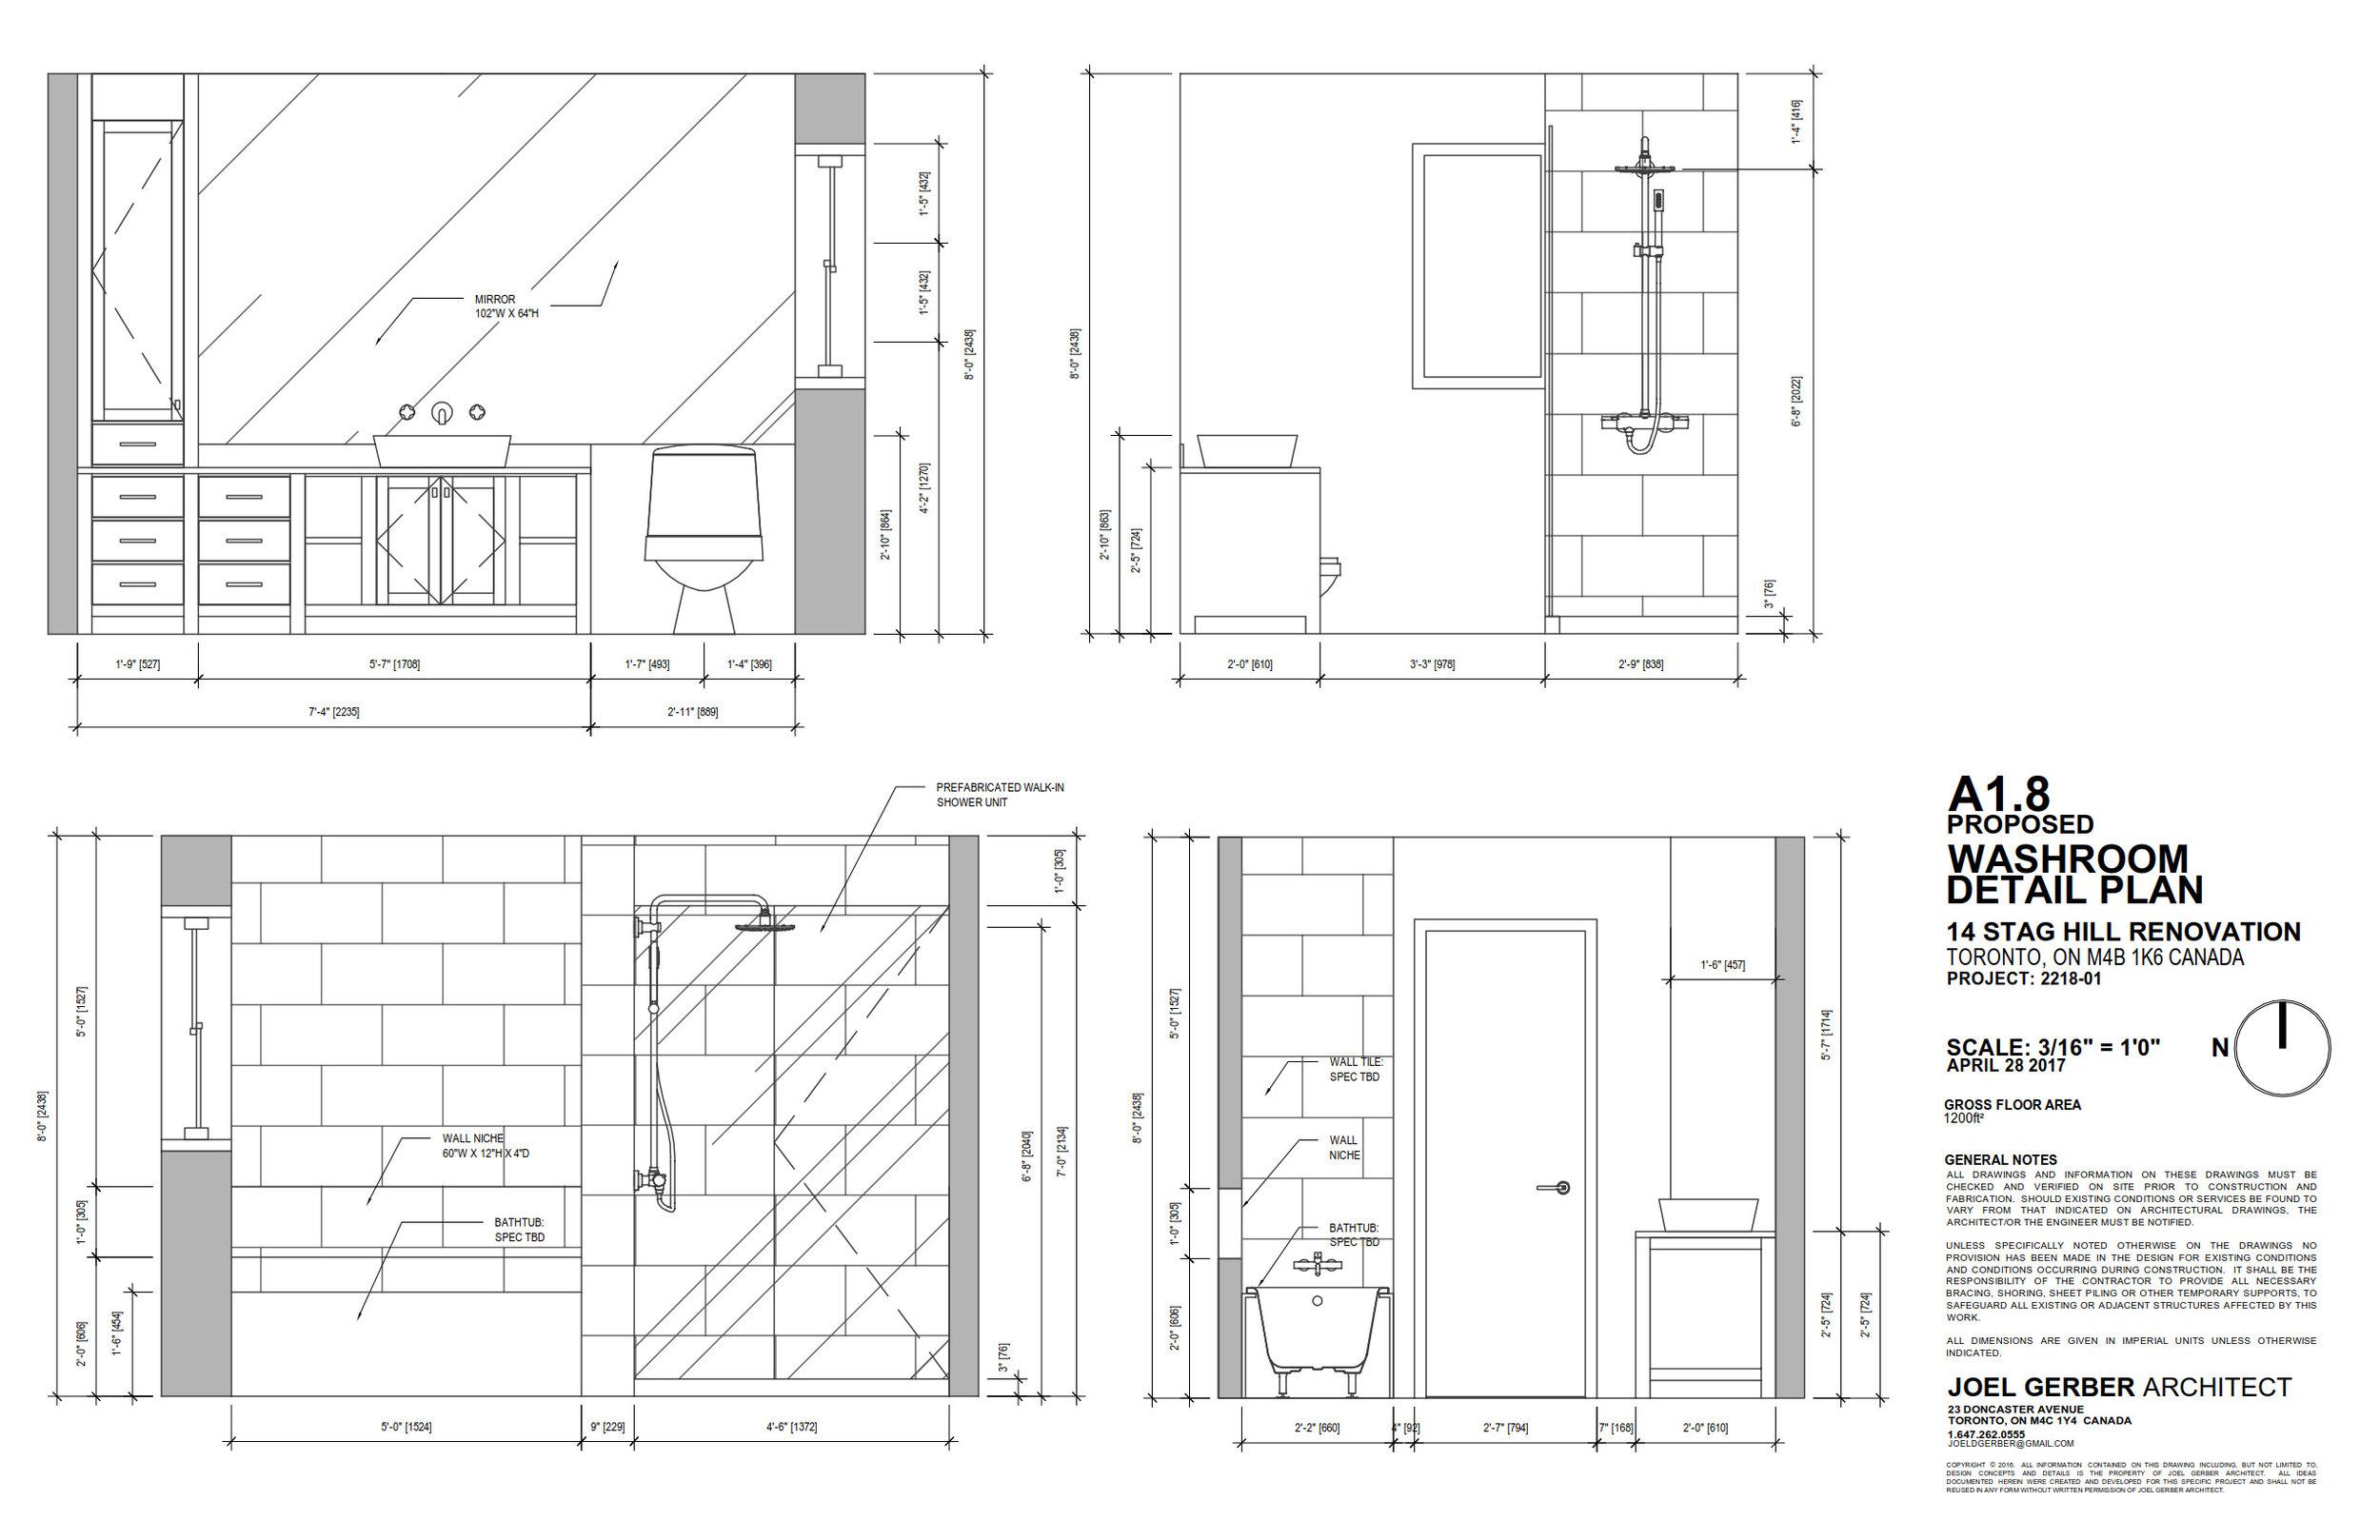 Drawing, Washroom Details